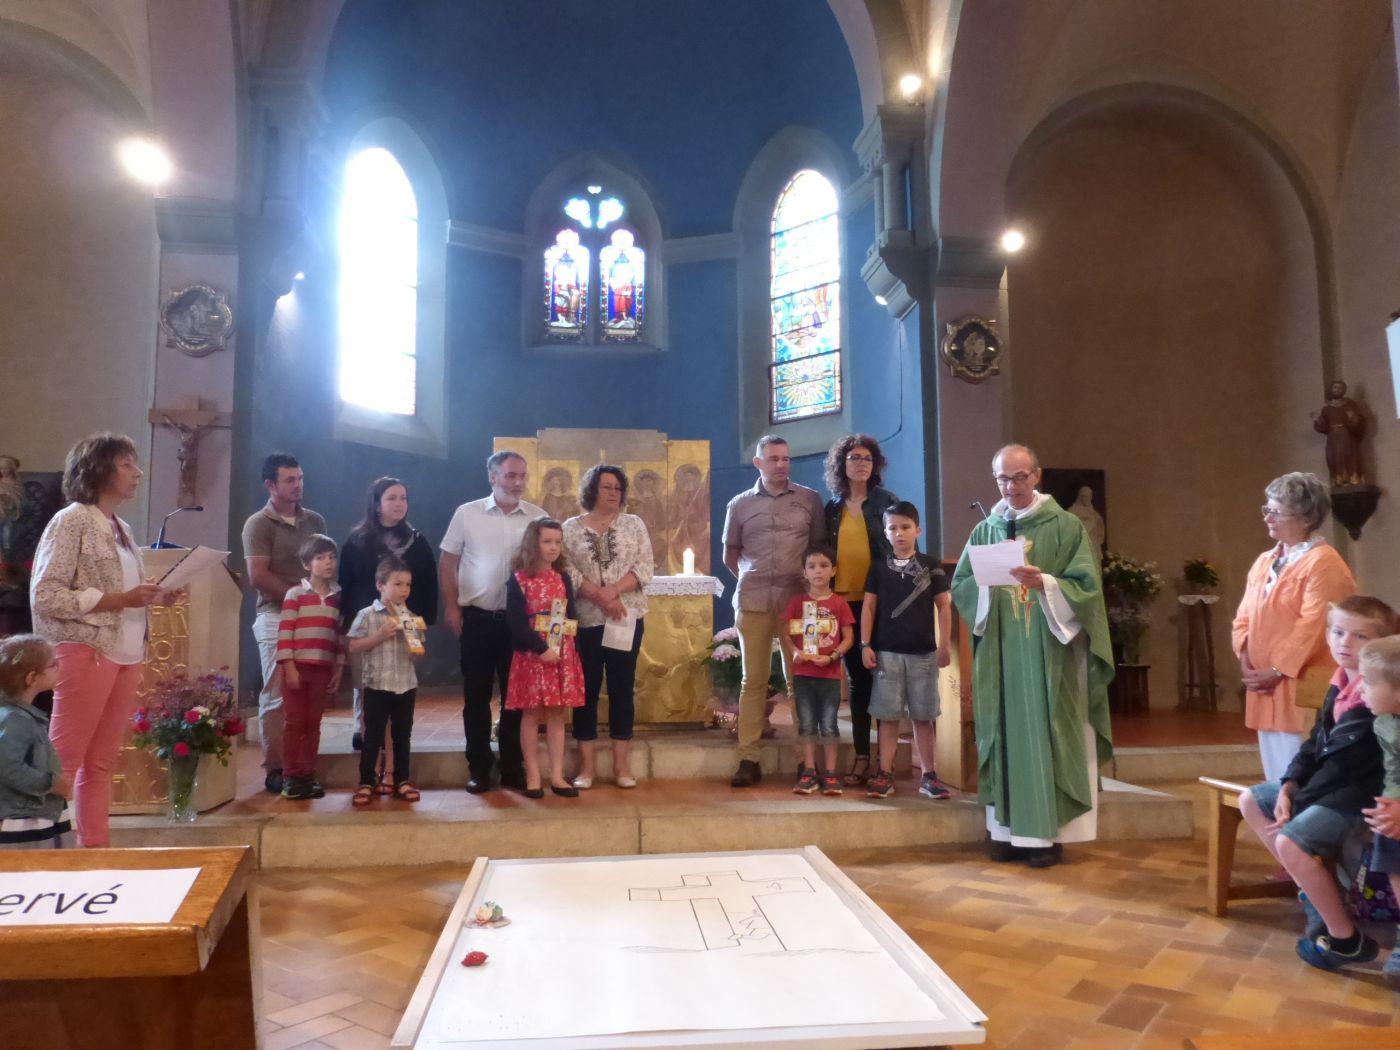 Demande-de-baptême-de-Yolan-Tristan-et-Aliénor